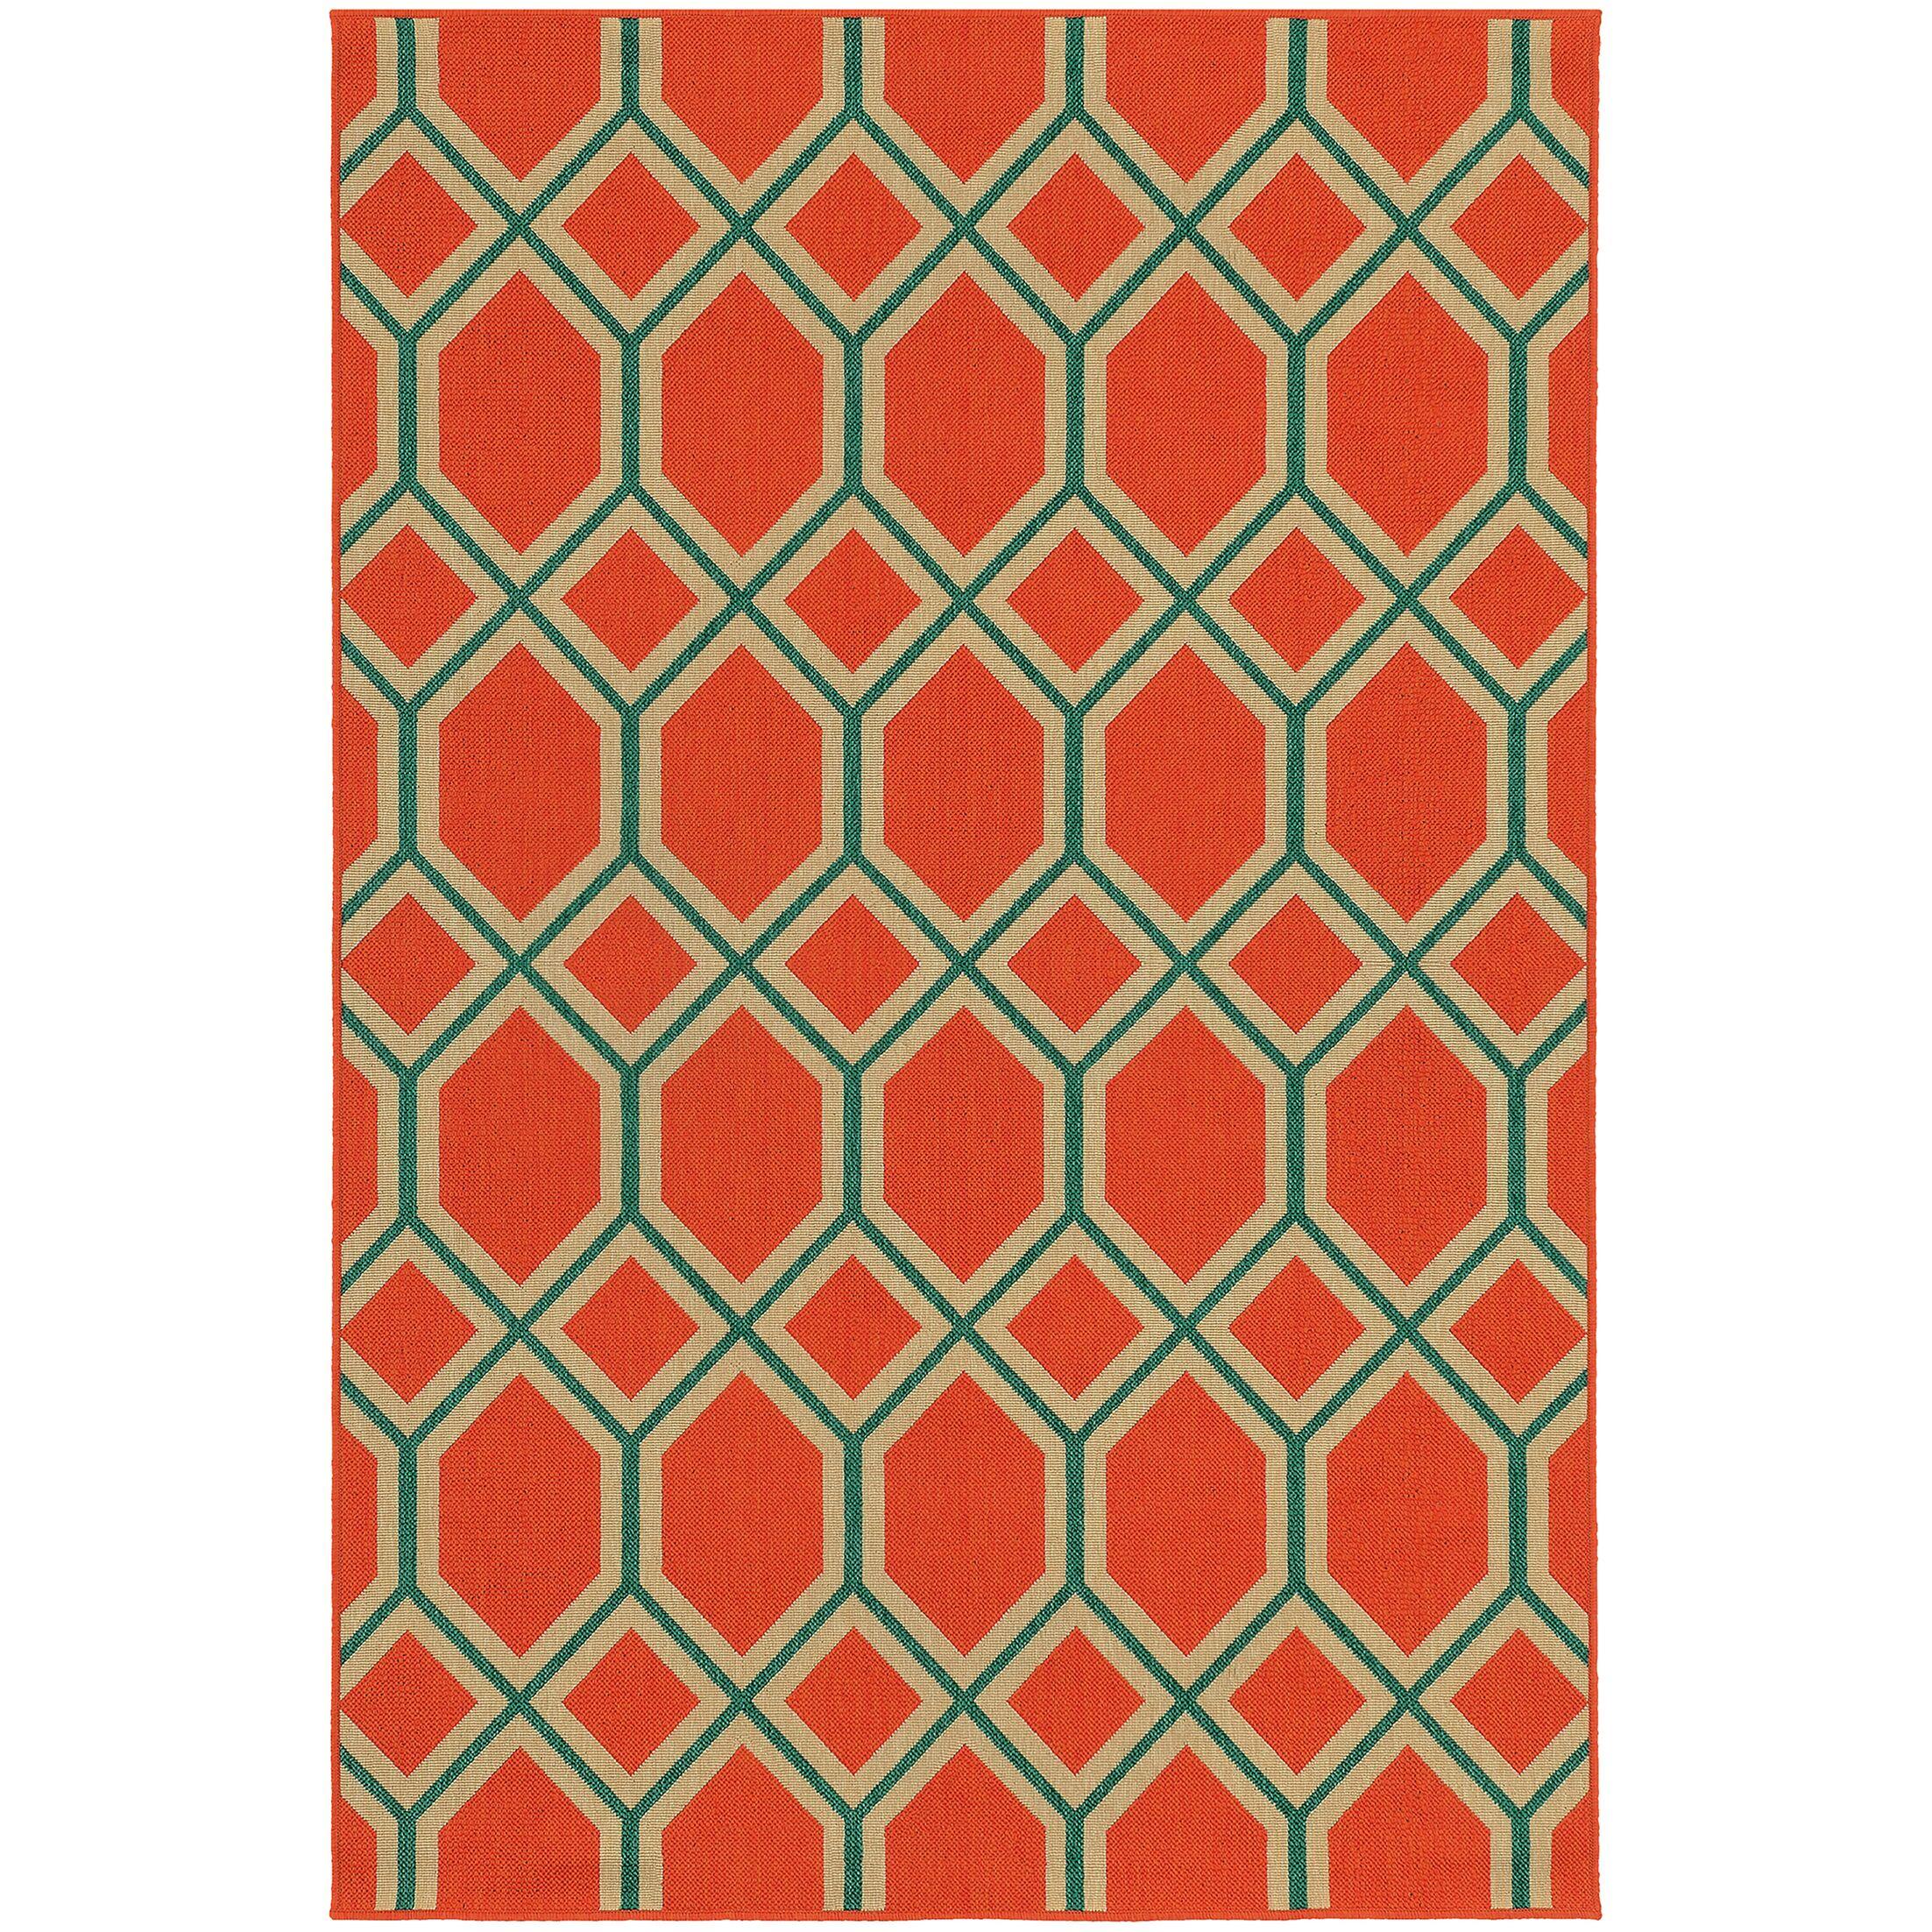 Seaside Orange/Teal Indoor/Outdoor Area Rug Rug Size: Rectangle 5'3